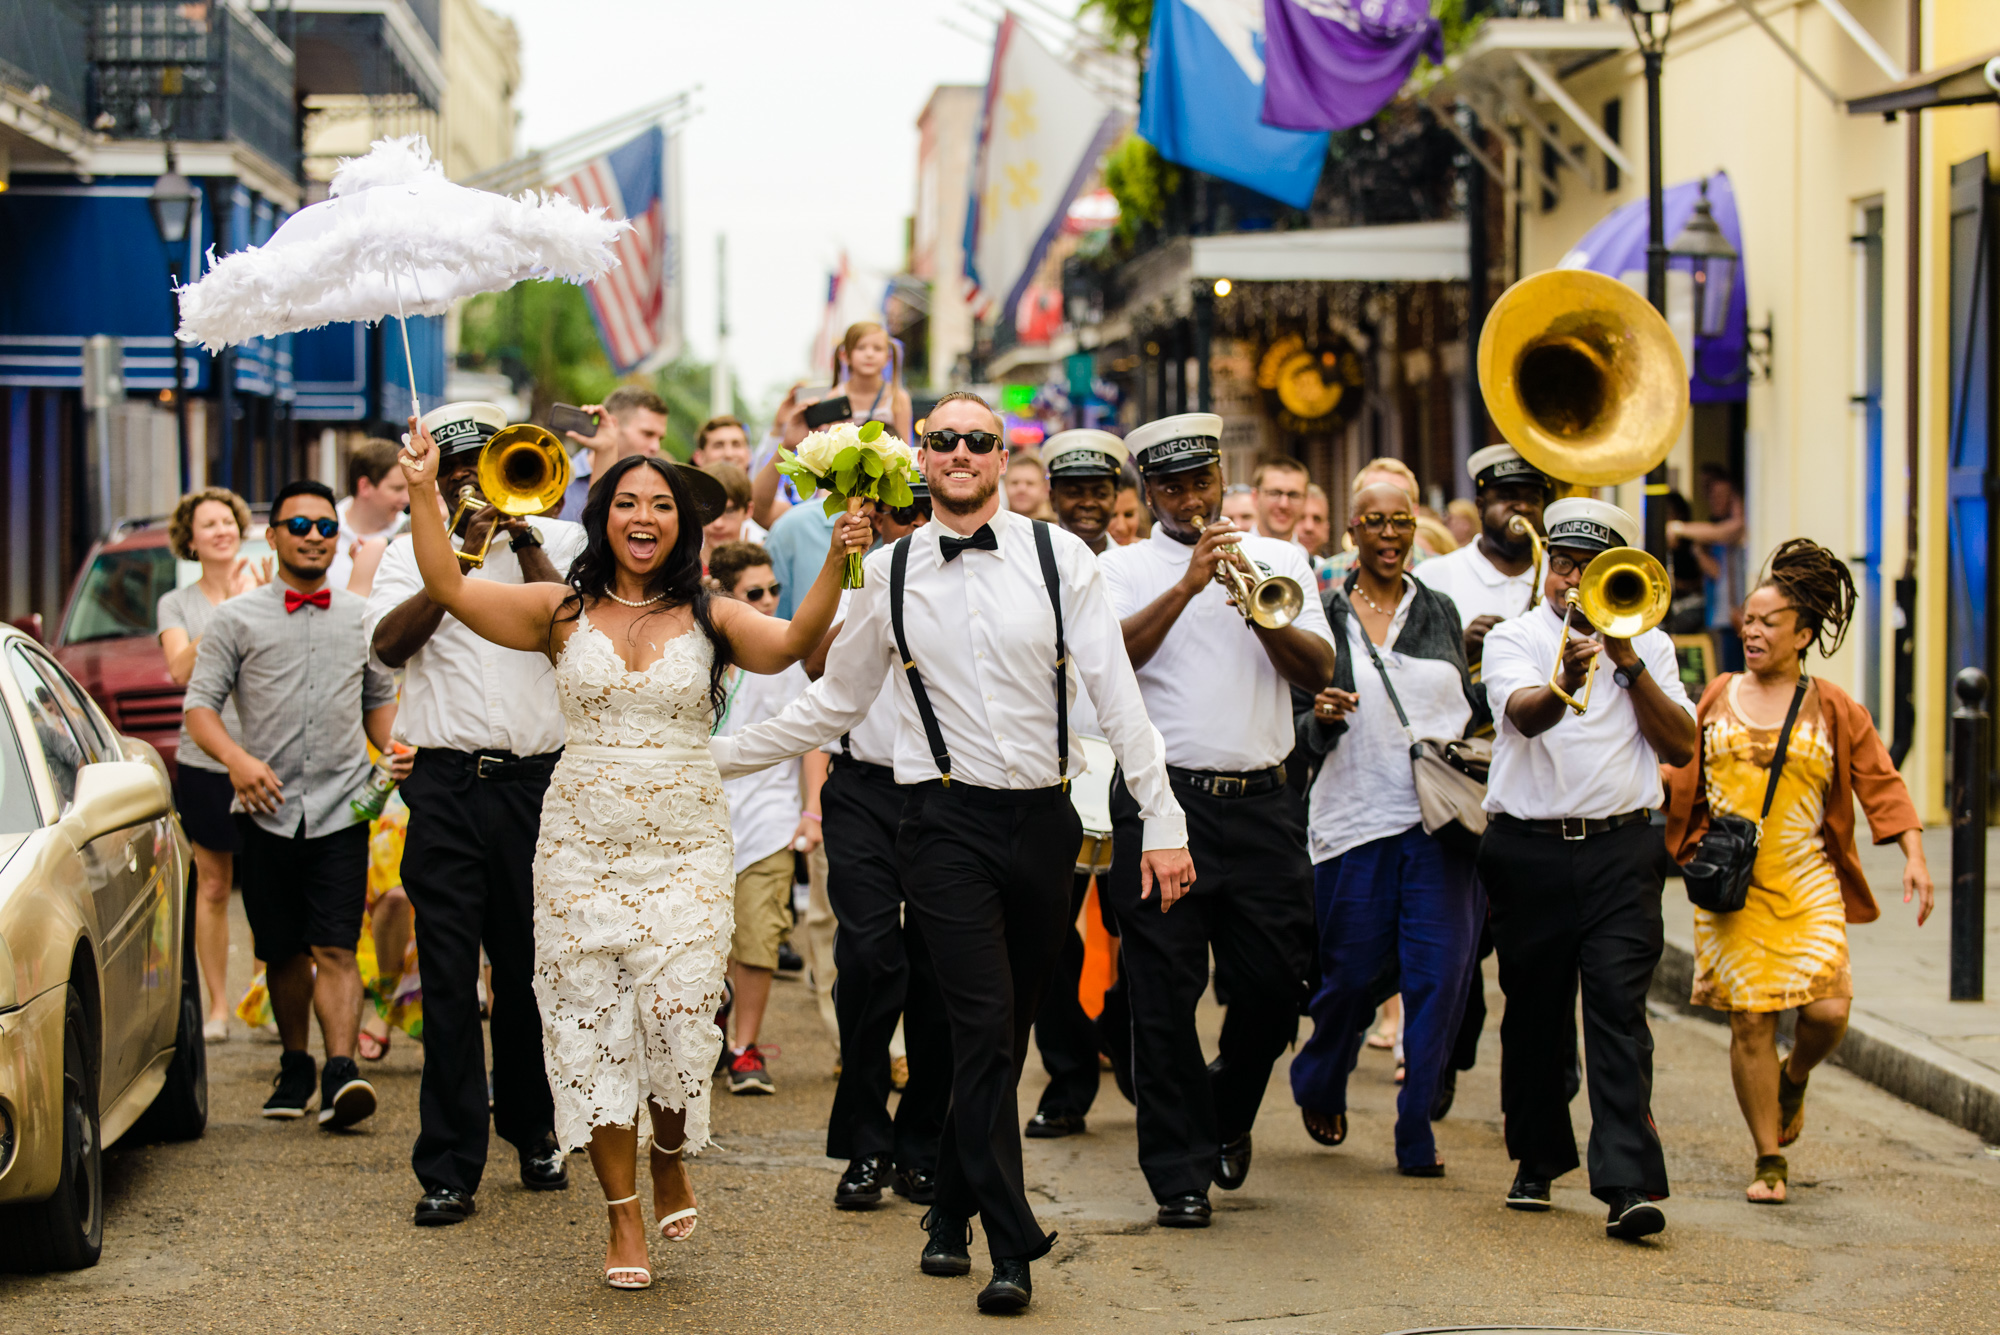 Scott-Myers-Photography-WeddingScott_Myers_Louisiana-6324.jpg